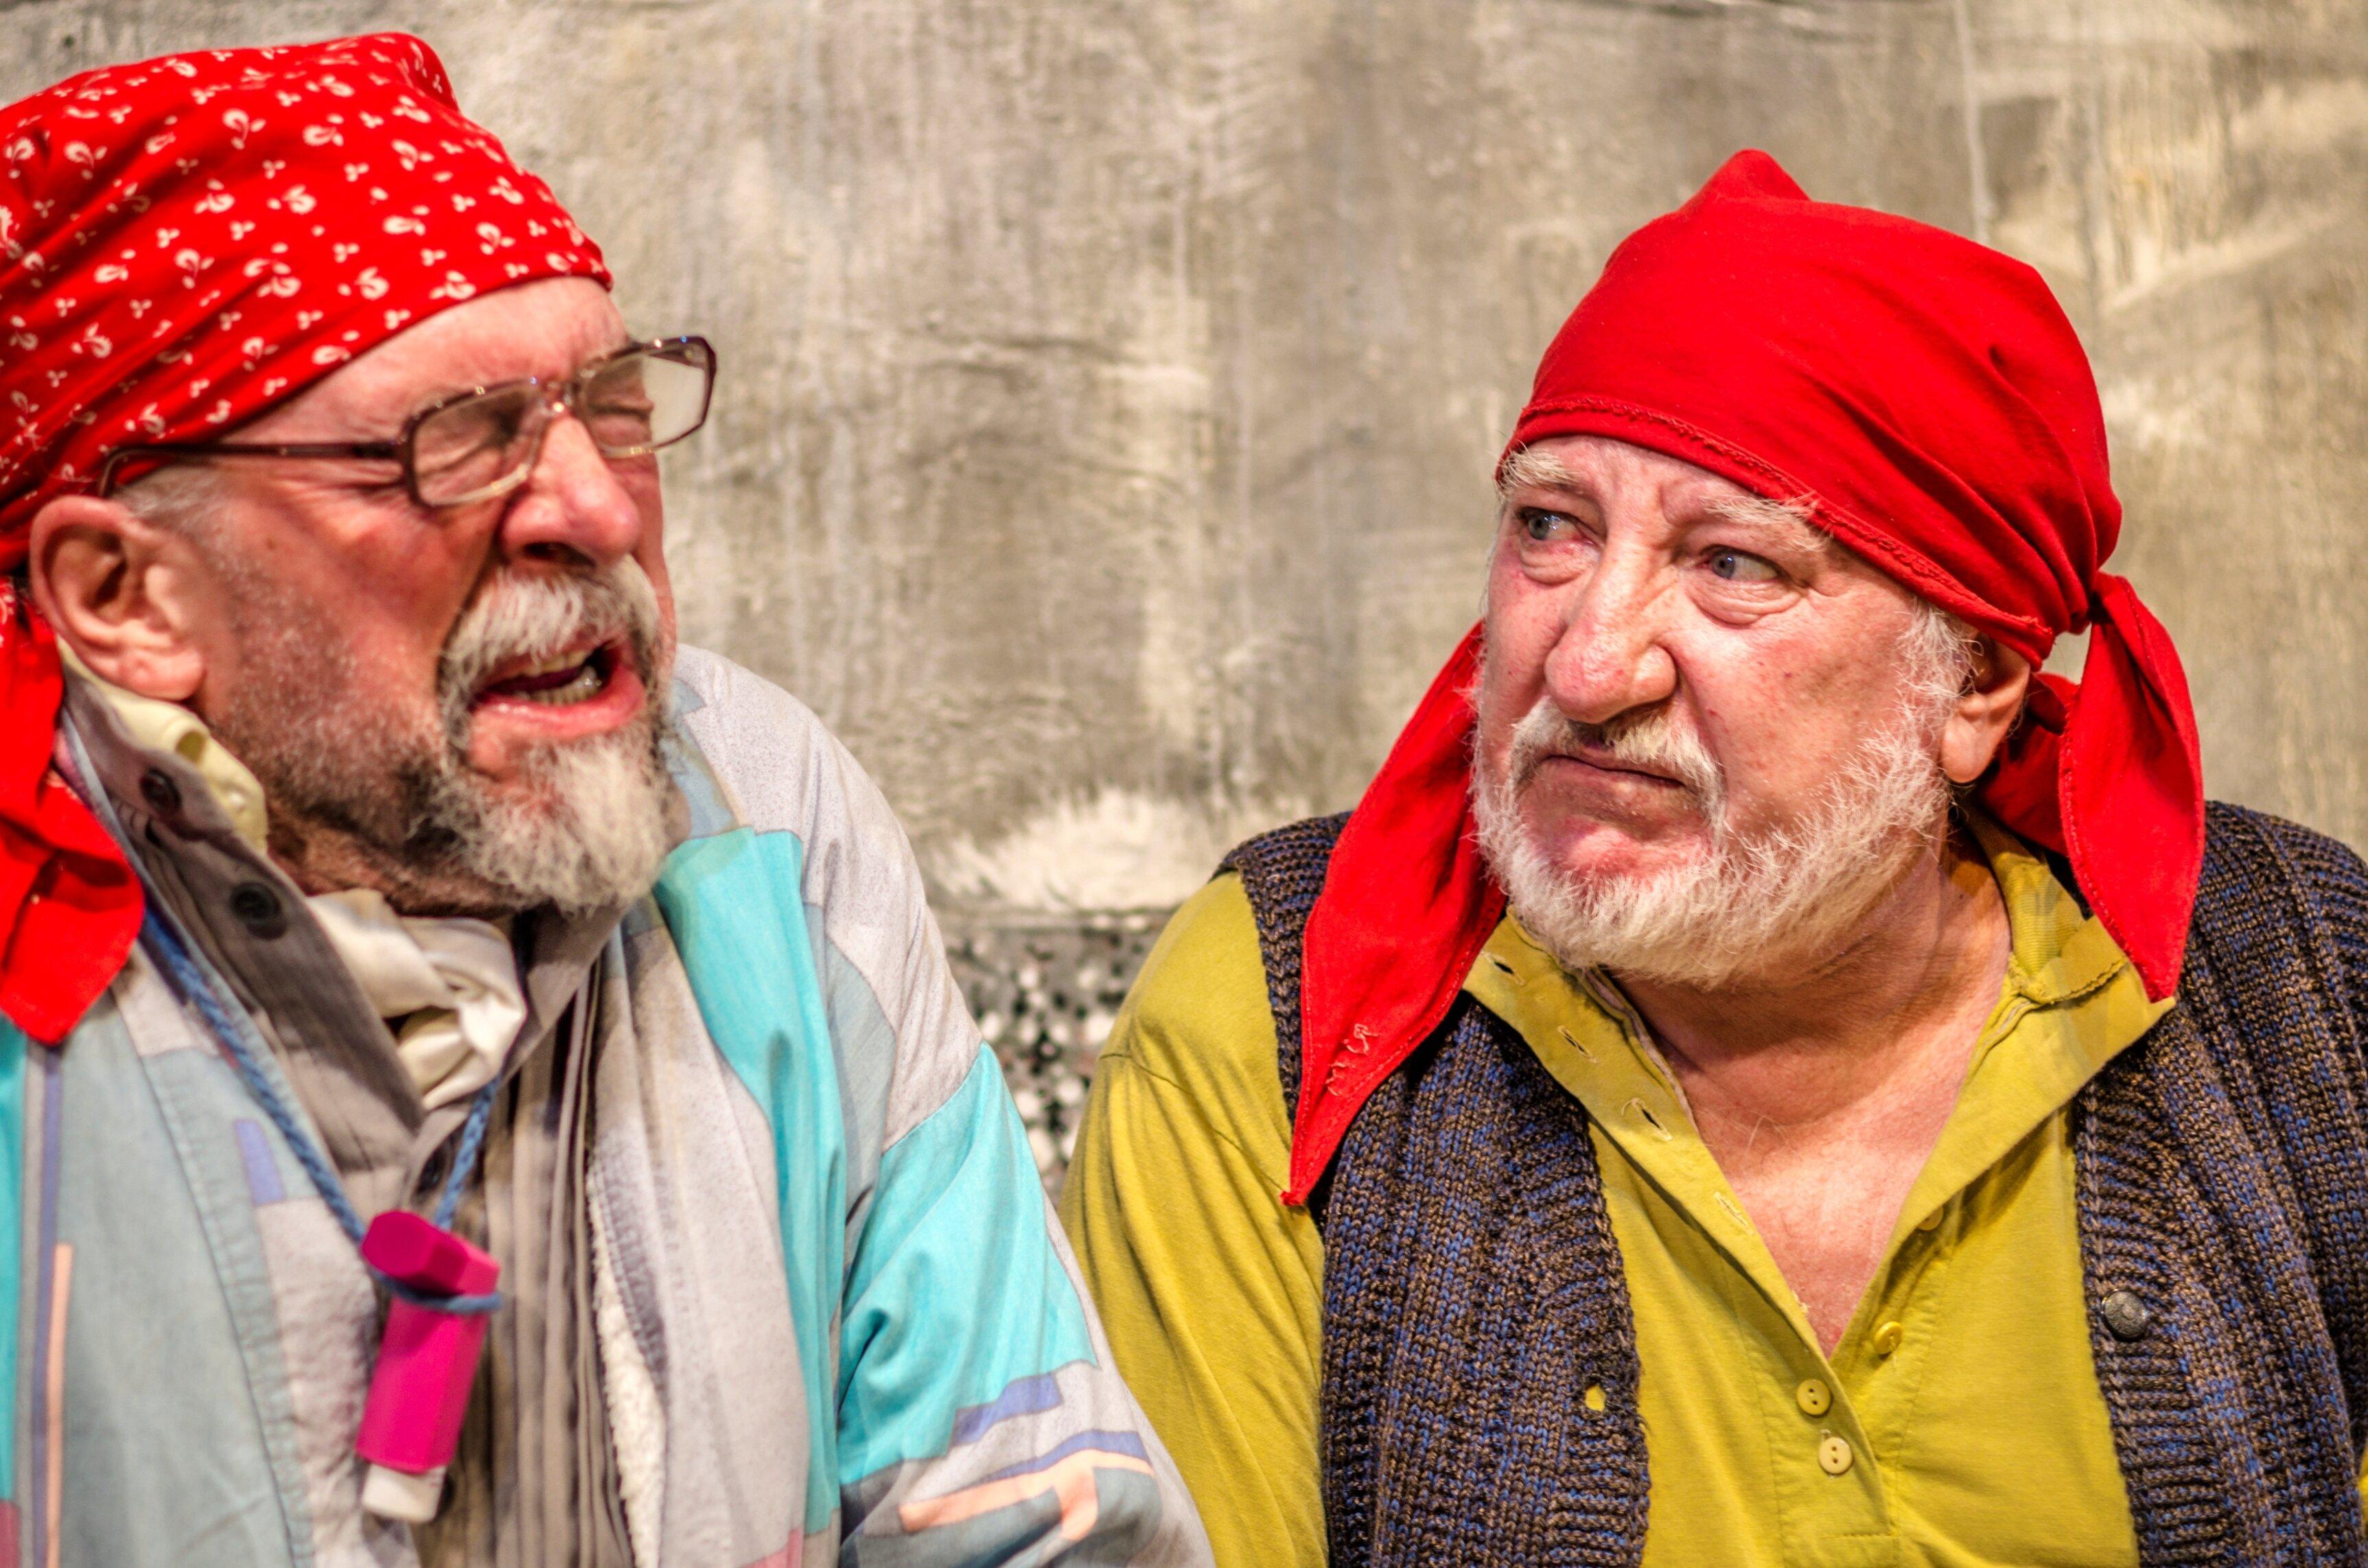 http://blagoevgradtheater.eu/images/_Snimki_ot_Teatyra/_igp0250.jpg